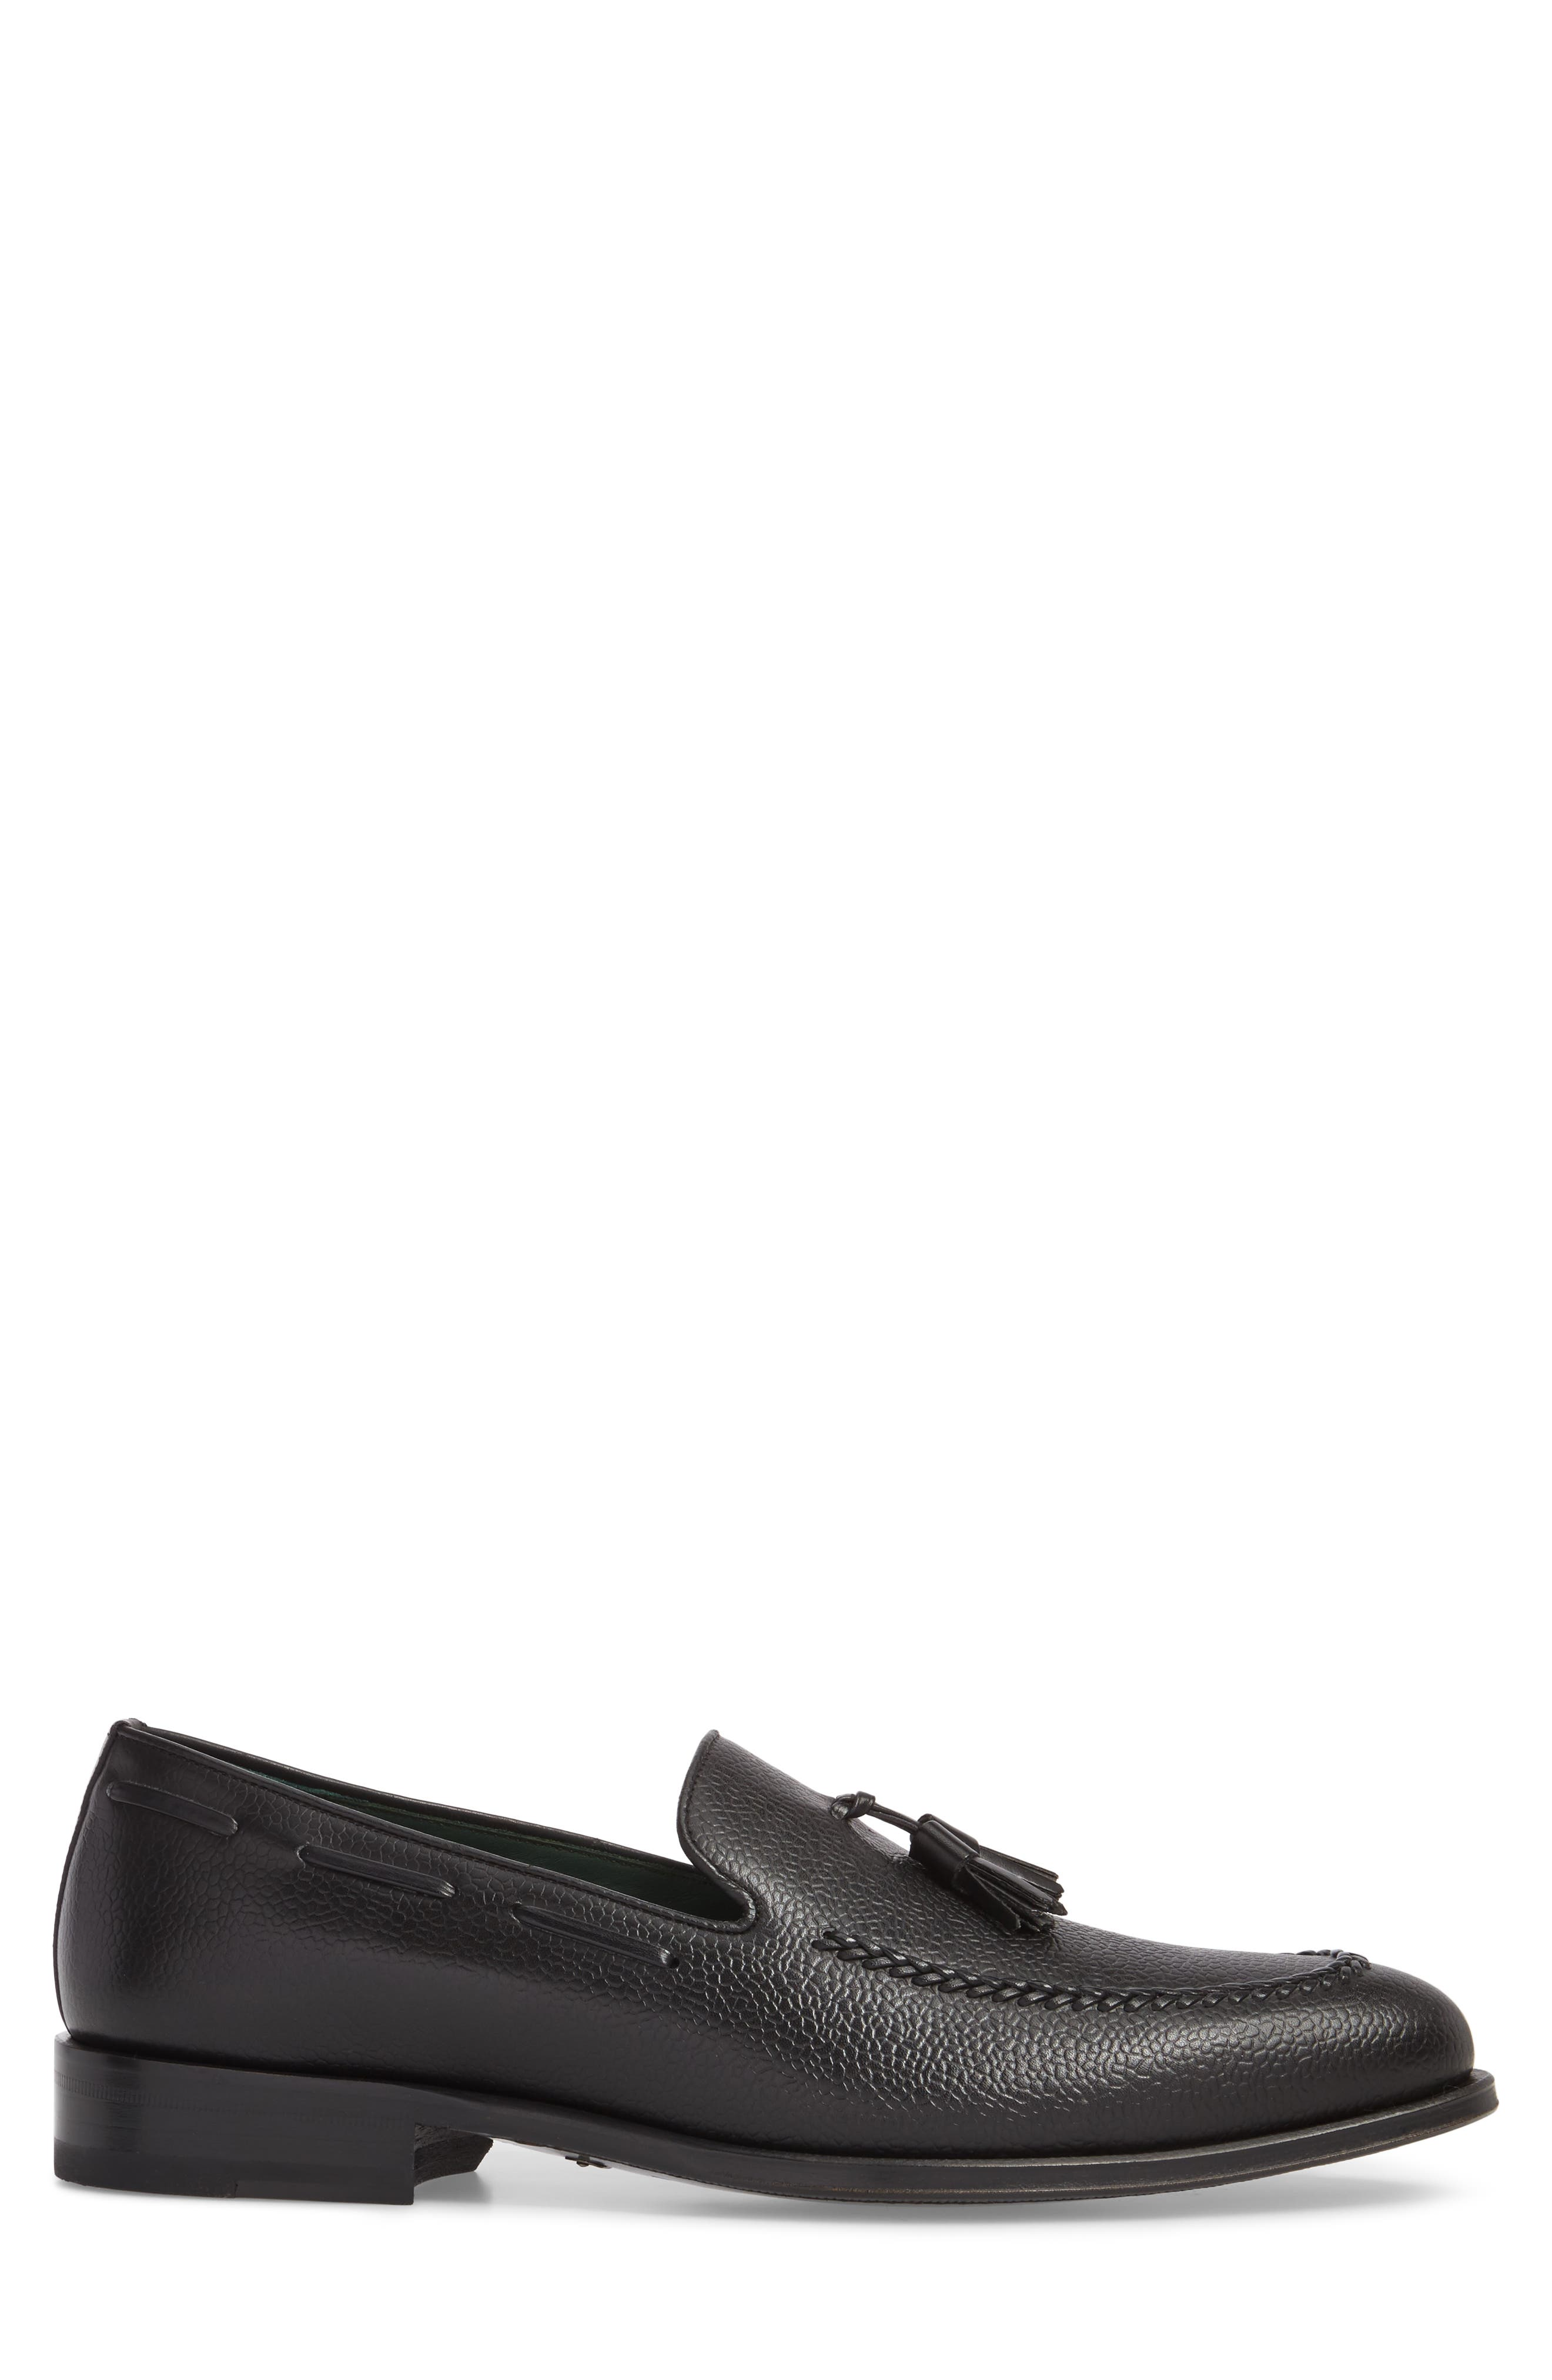 Sabina Tasseled Venetian Loafer,                             Alternate thumbnail 3, color,                             BLACK LEATHER